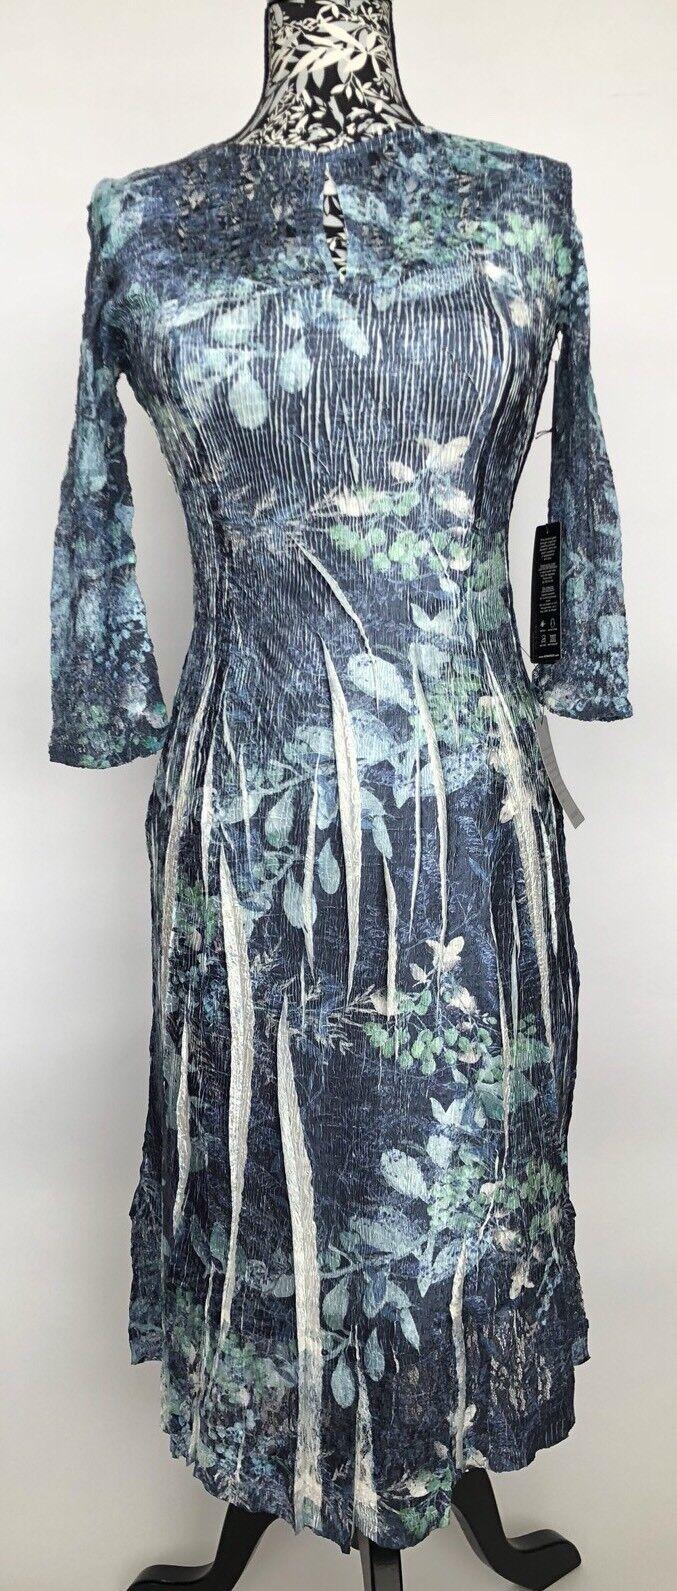 Komarov kvinnor Dress Storlek M NWT blå Lace Made in USA